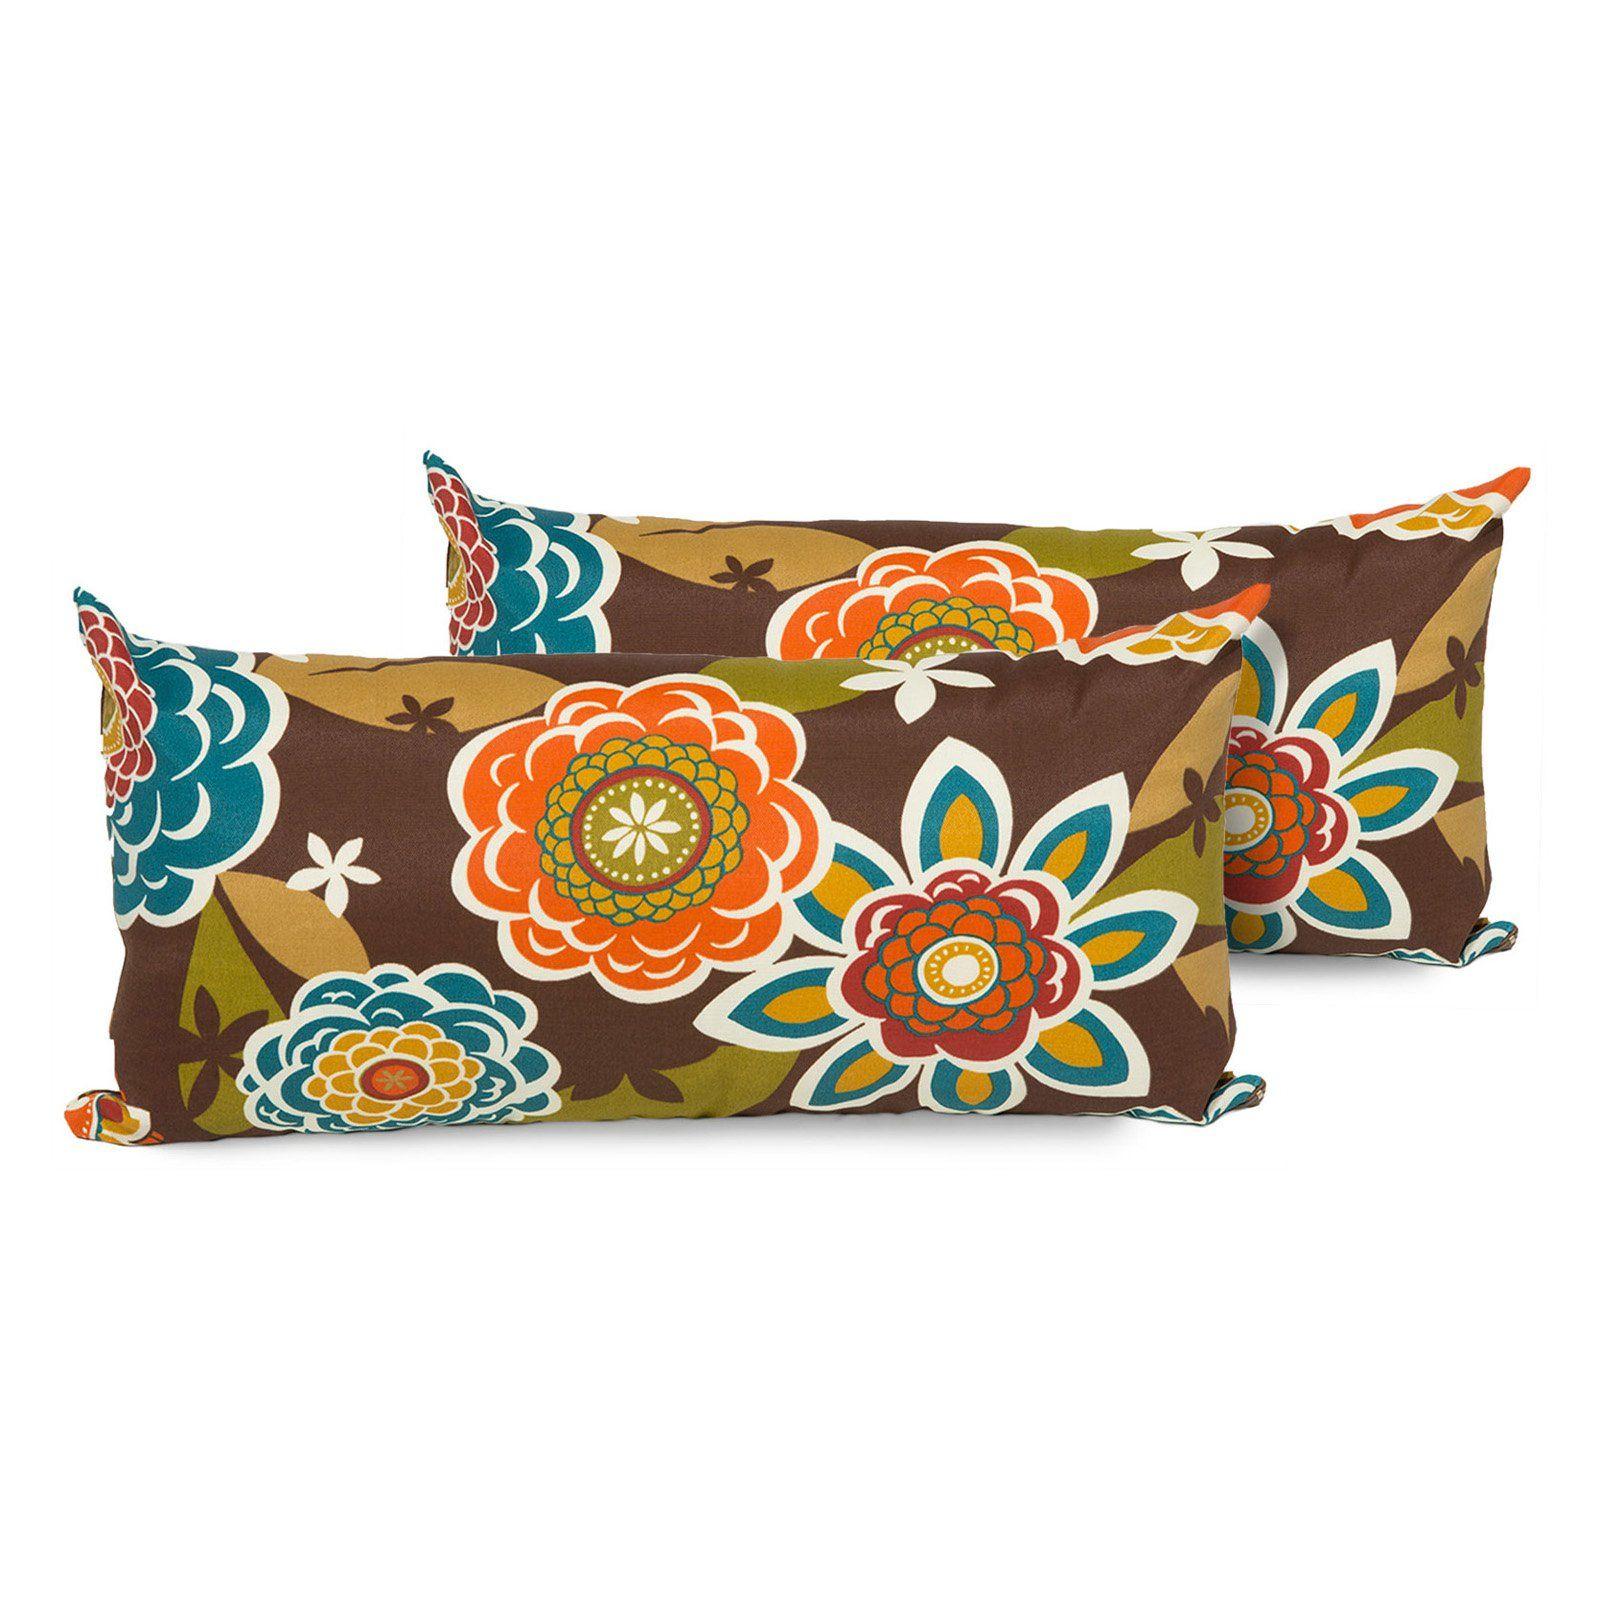 Tk Classics Retro Floral Outdoor Throw Pillows Set Of 2